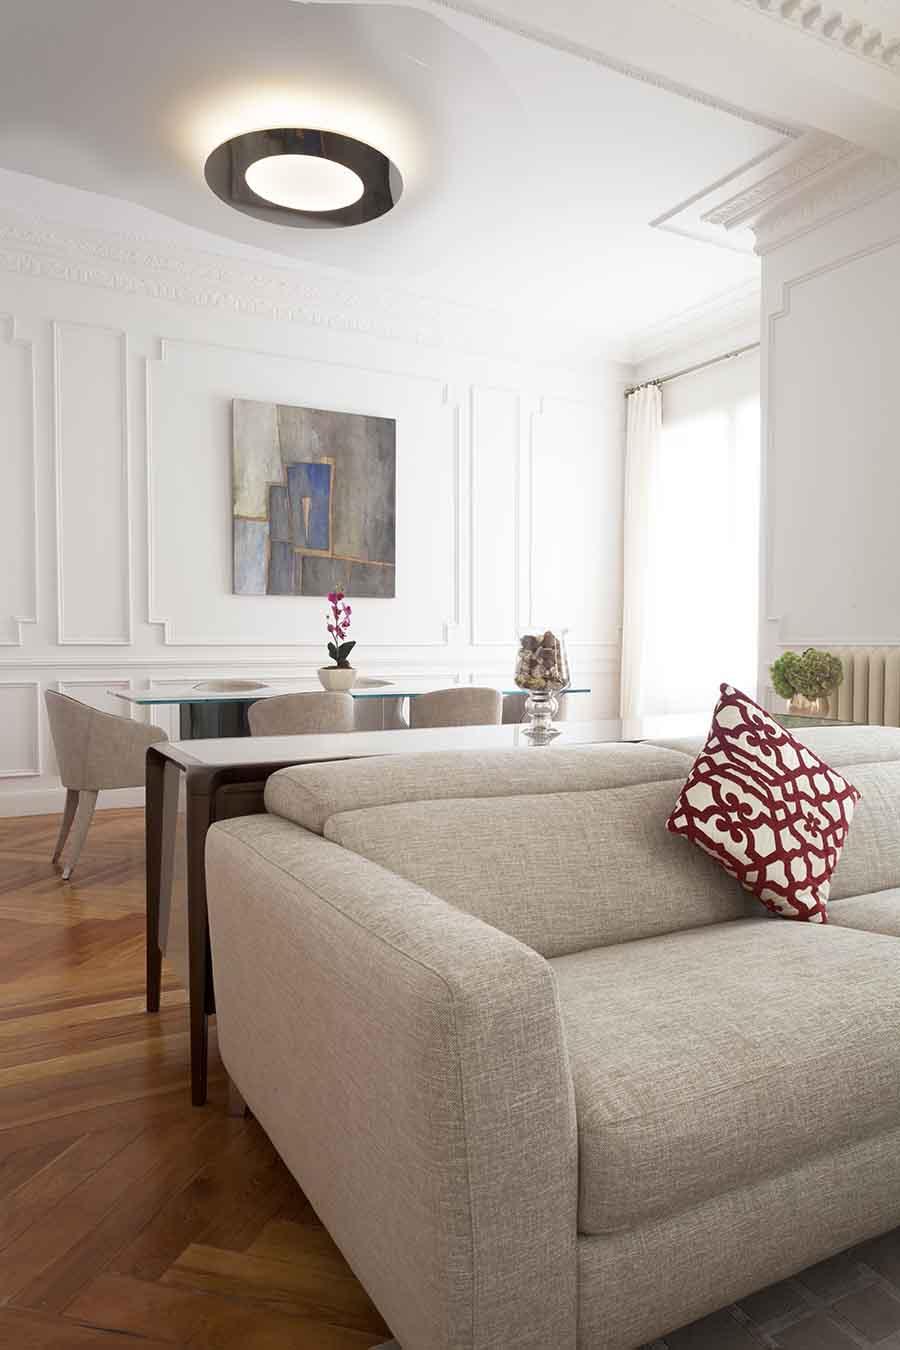 Alfonsoxi07 alicia mesa dise adora de interiores y - Disenadora de interiores ...